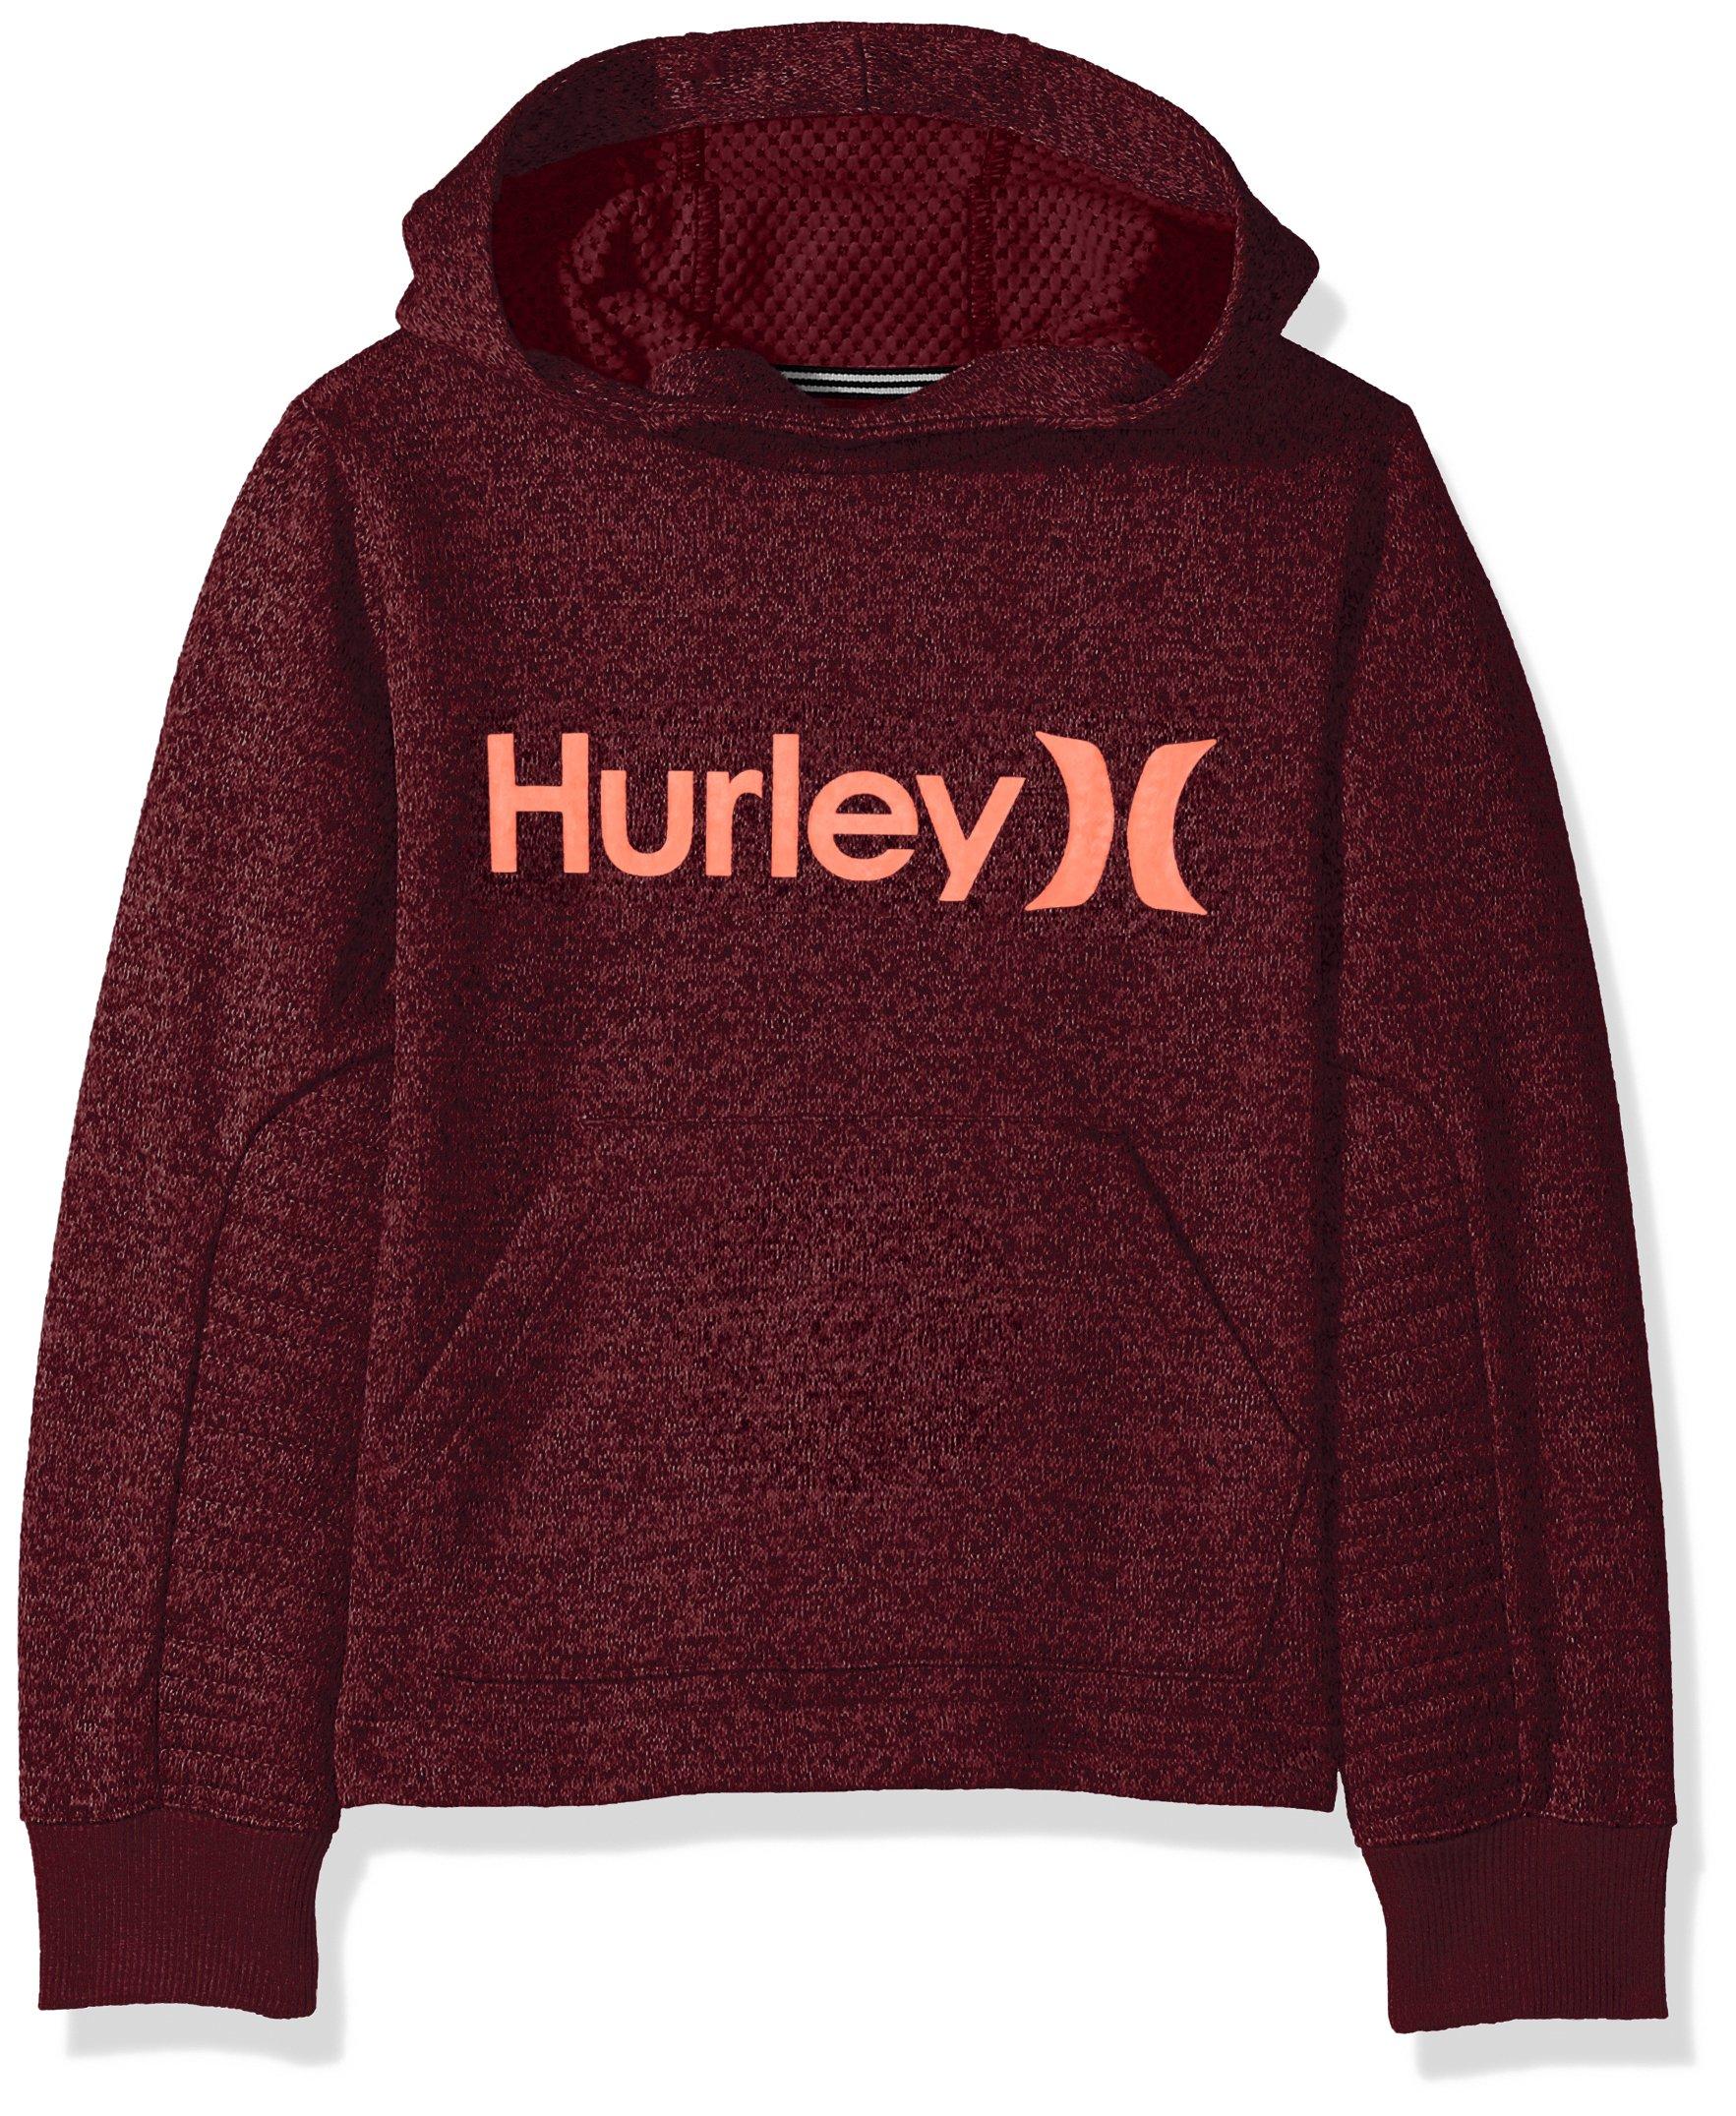 Hurley Boys' Toddler Pullover Hoodie, Deep Garnet Heather 3T